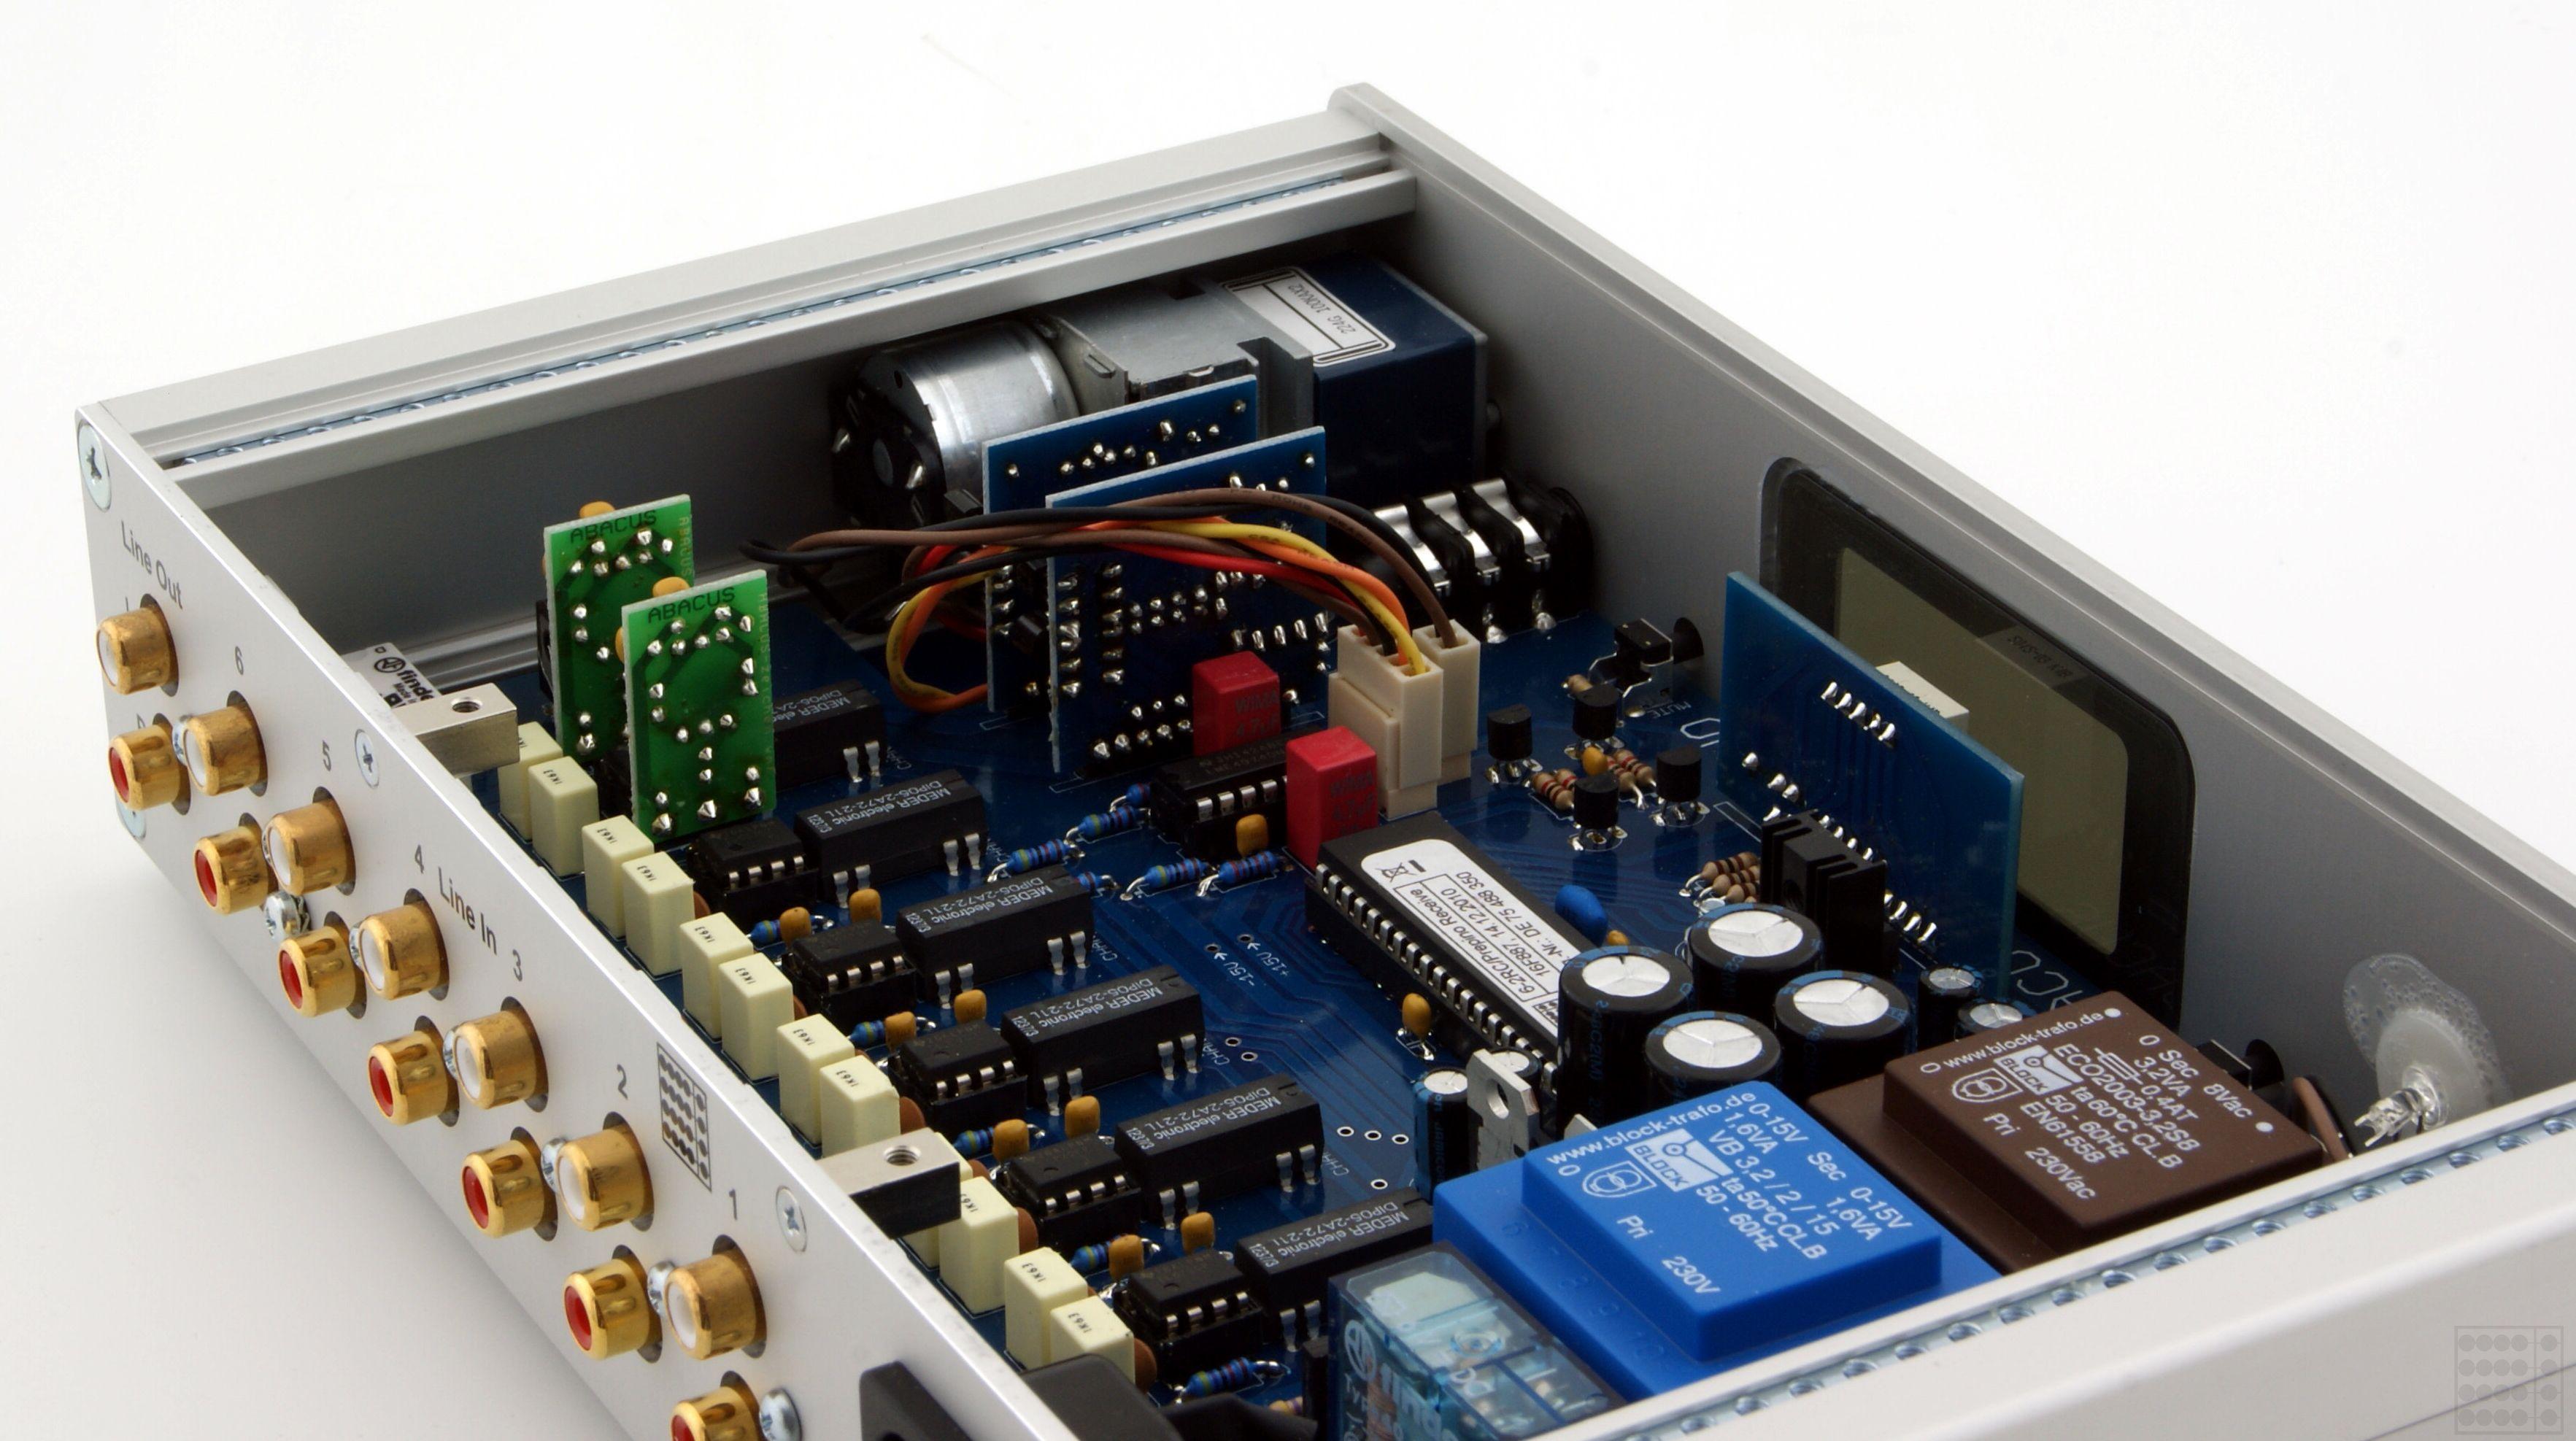 ABACUS Prepino 13 RC - v.r. Alps-Rk27-Motorpoti, h.r. hochkant Phono-EVV-Modul (optional) und Linetreiber-Module